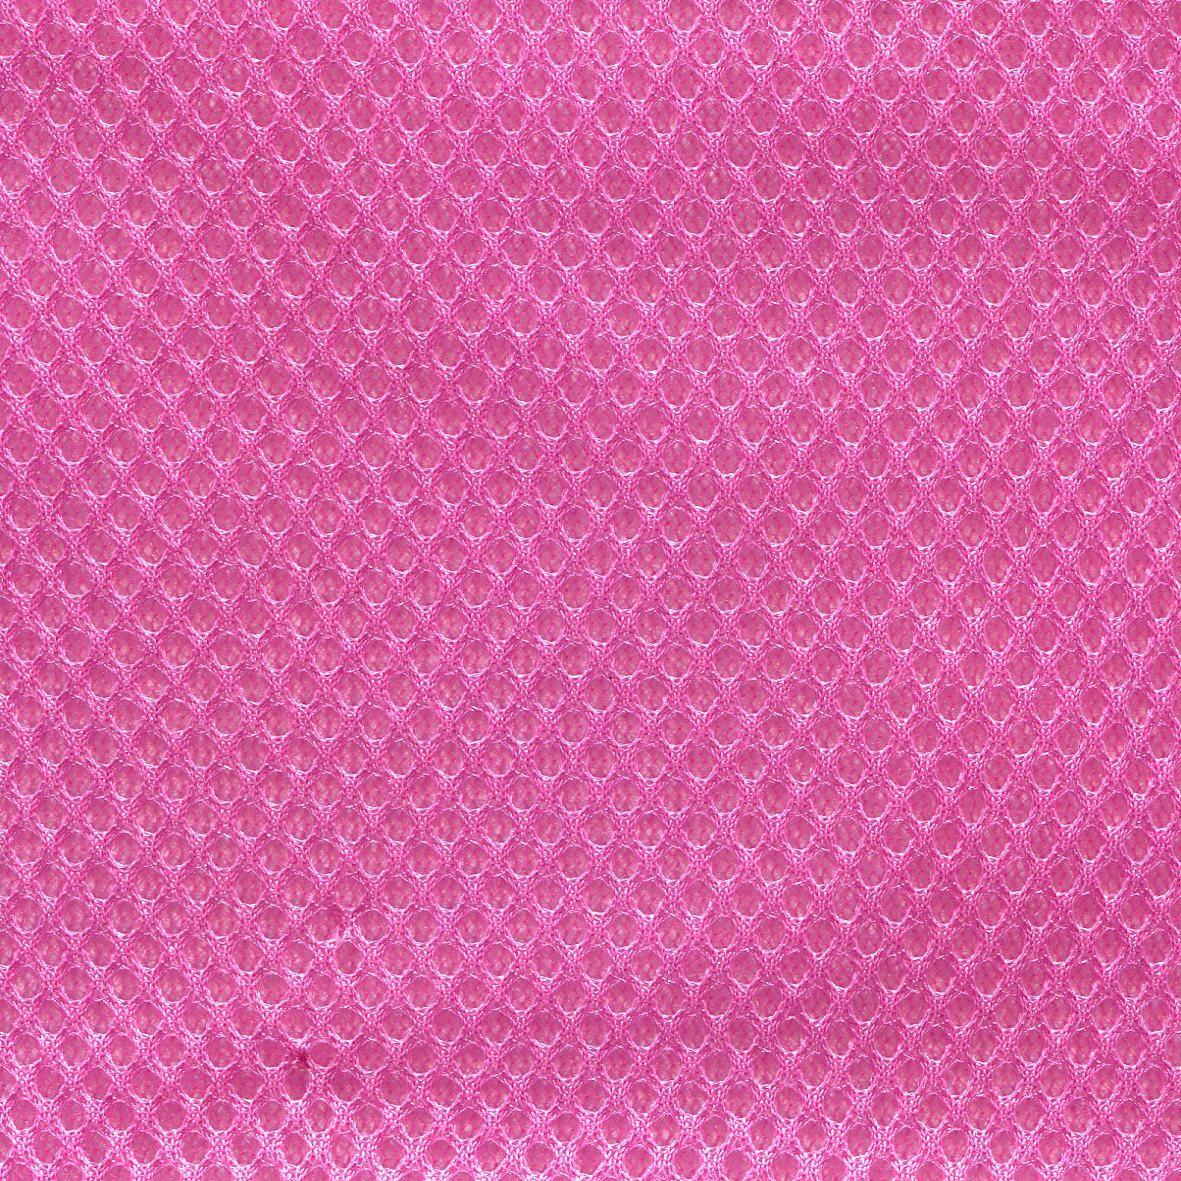 Сетка на поролоне 3D AIRTEX сумочная, обувная Розовый